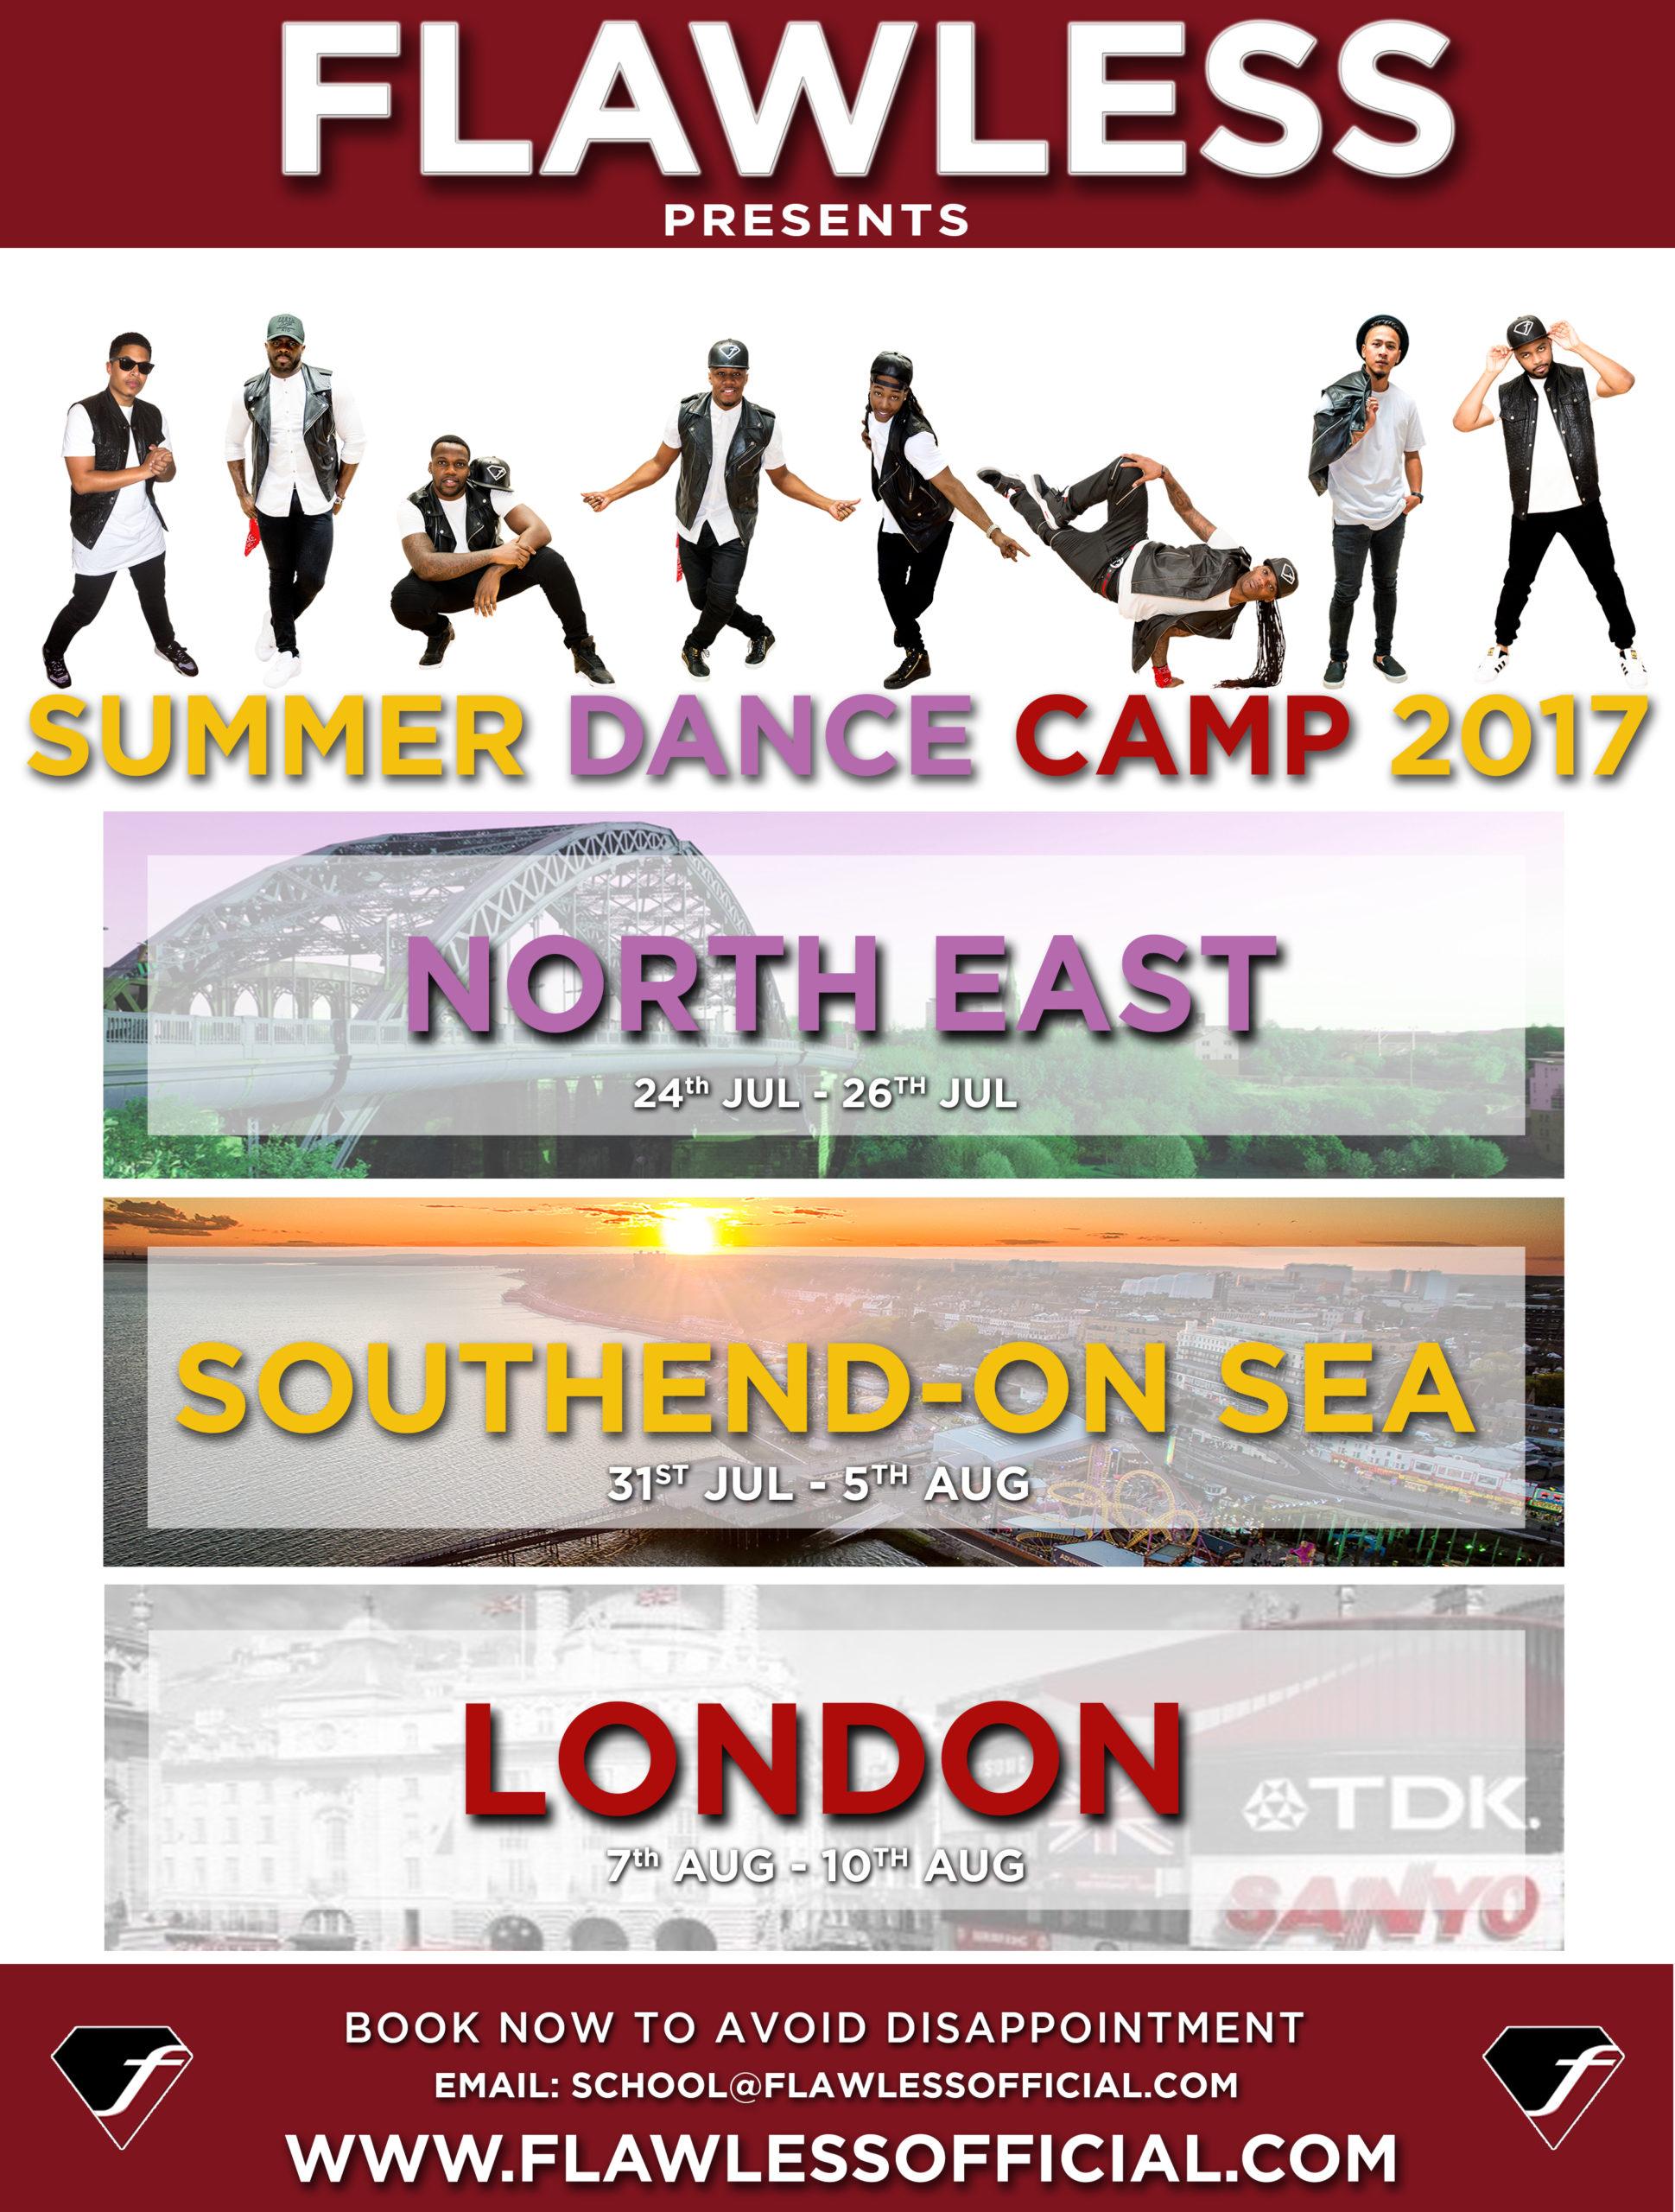 FLAWLESS SUMMER DANCE CAMP 2017